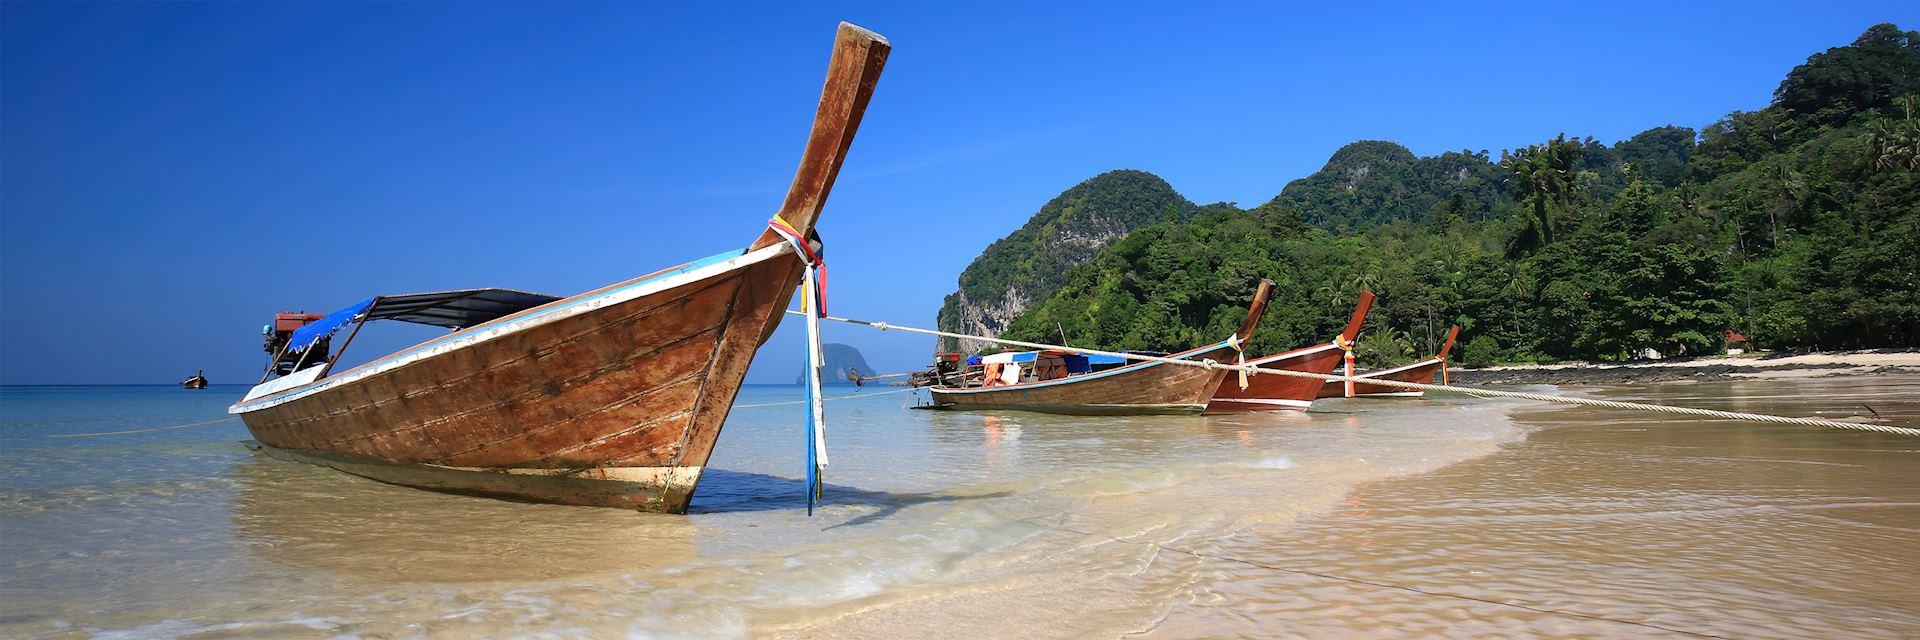 Long tail boat, Koh Lanta